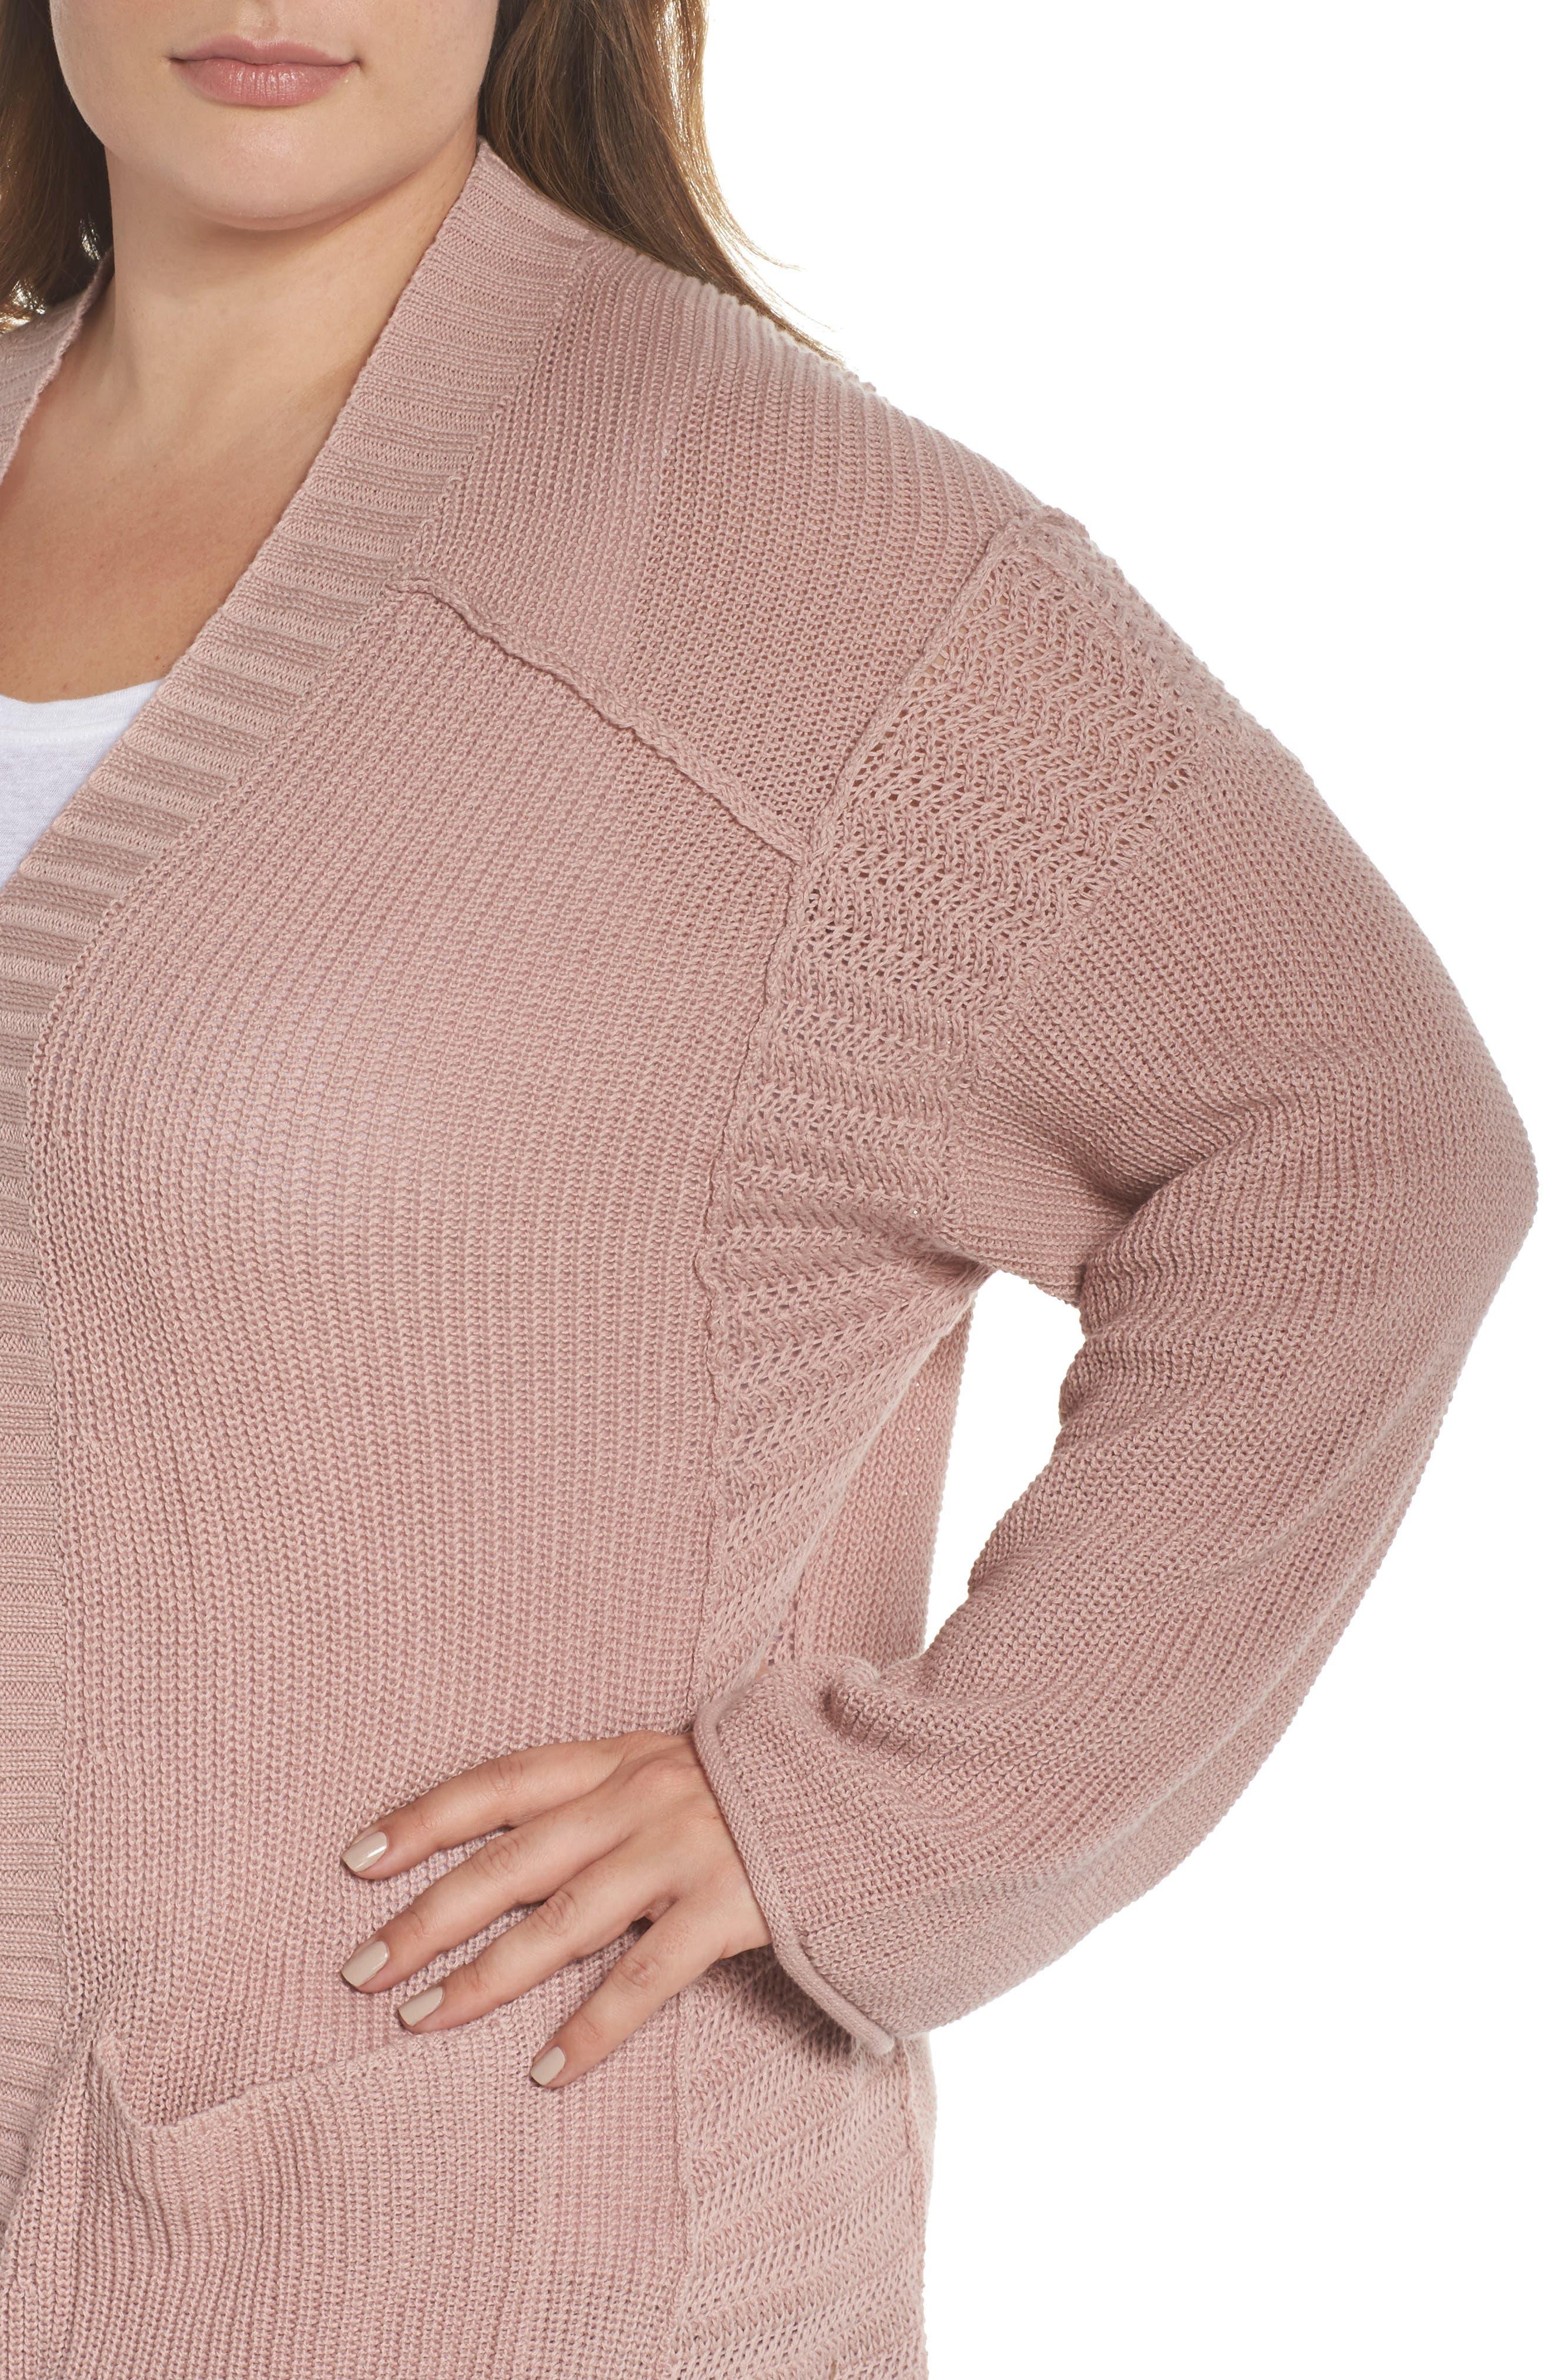 Sweater Knit Cardigan,                             Alternate thumbnail 4, color,                             Pink Adobe